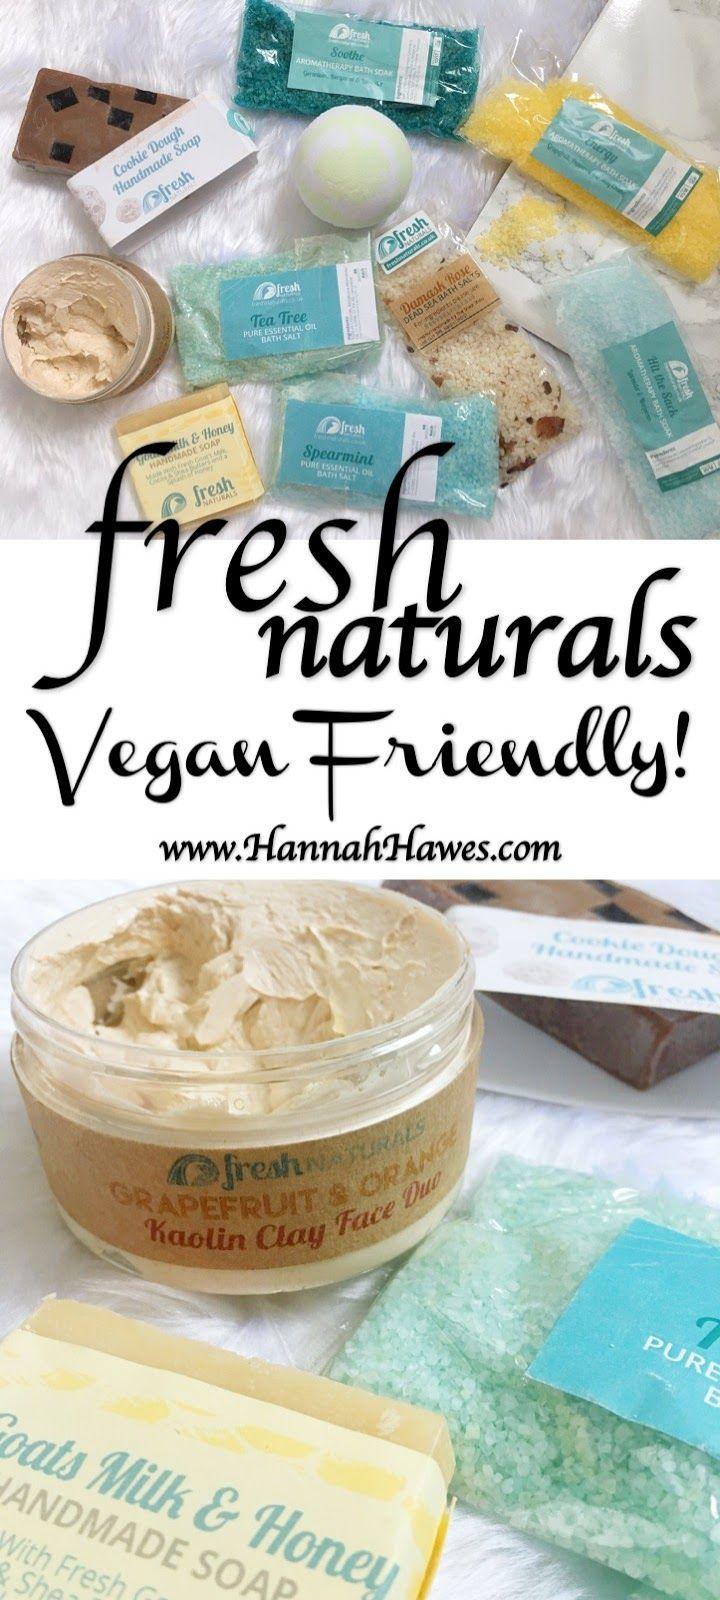 Fresh naturals bath and skincare. 100% natural and vegan friendly. Bath salts, bath bombs, face mask.  www.HannahHawes.com